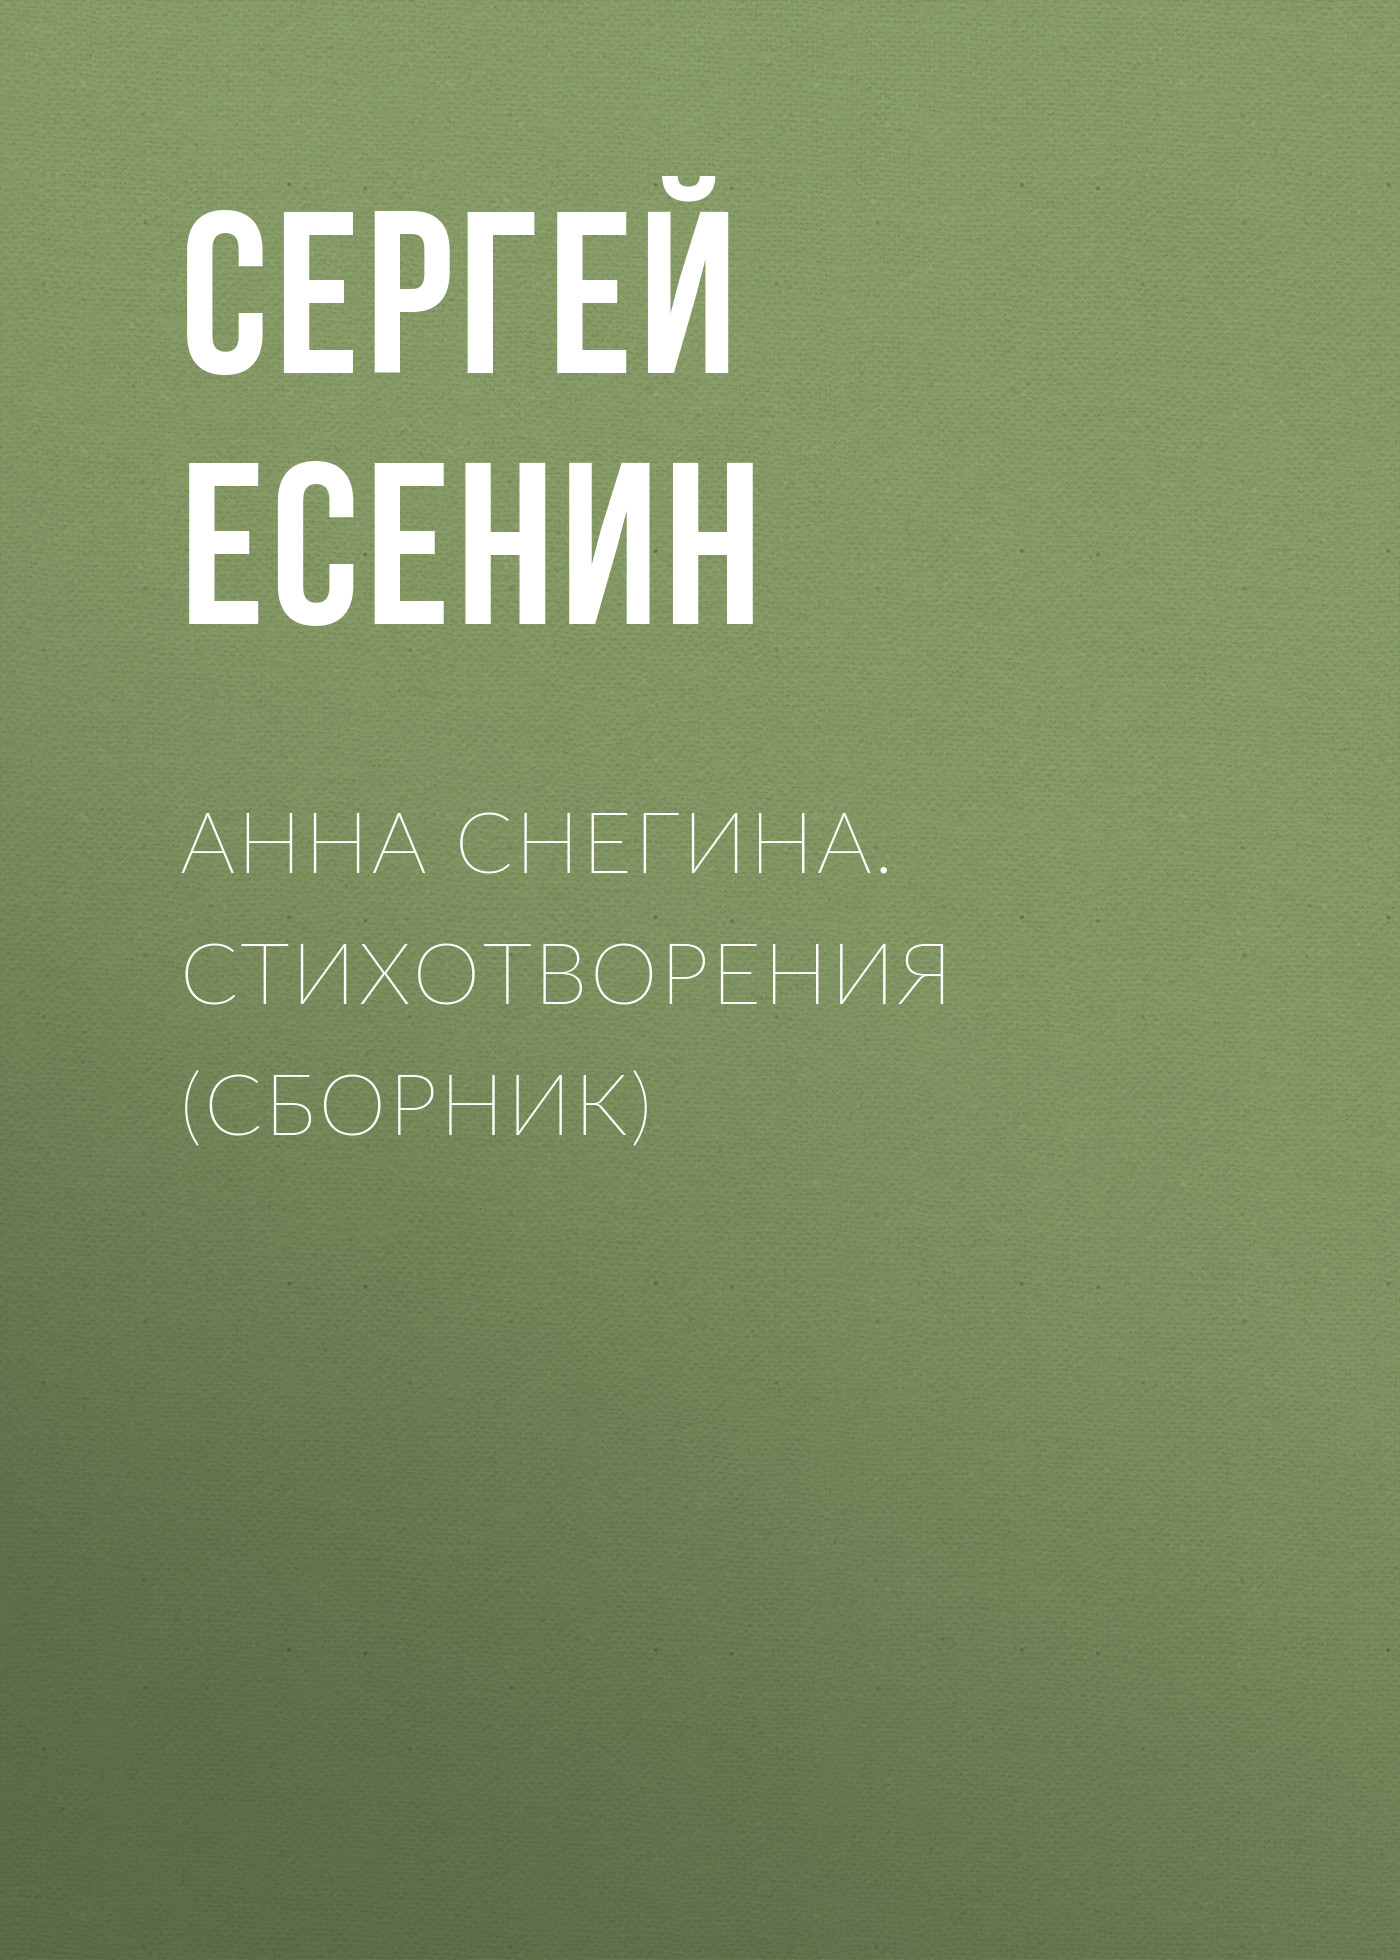 цена на Сергей Есенин Анна Снегина. Стихотворения (сборник)